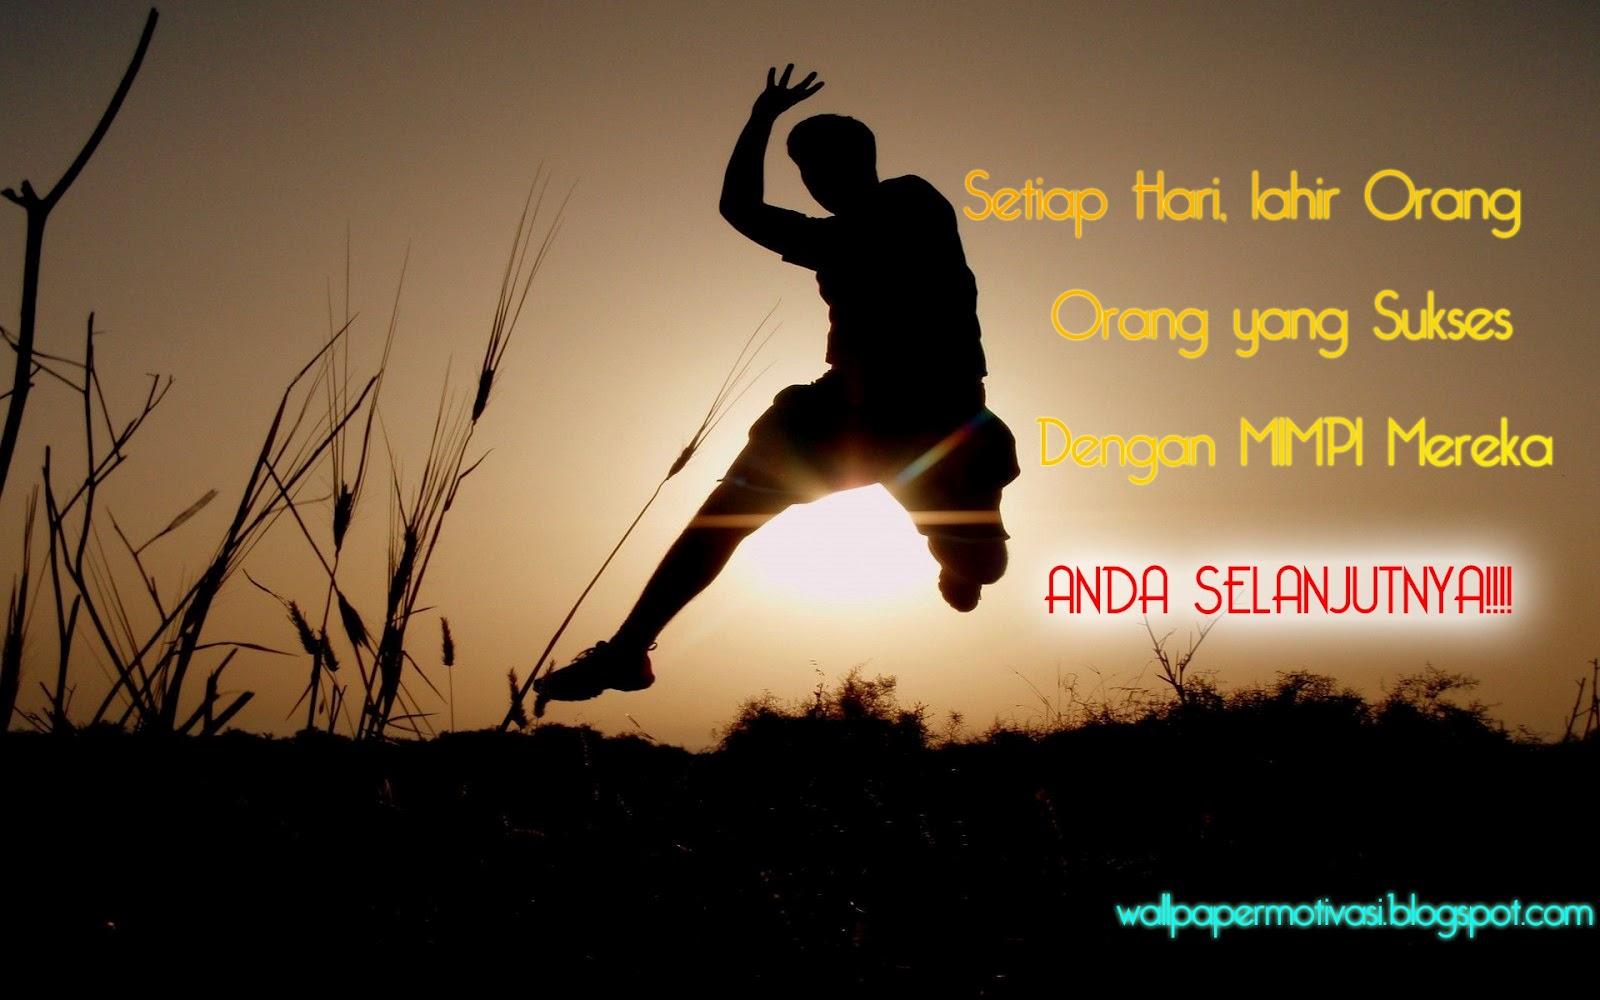 http://1.bp.blogspot.com/-yVrS2pTHA8w/UEvoV3wPvuI/AAAAAAAAAQA/5VLZMmbdBPY/s1600/gambar+motivasi-kata+kata+bijak+tentang+kehidupan-kata+bijak+hari+ini-lahir+orang+sukses.jpg